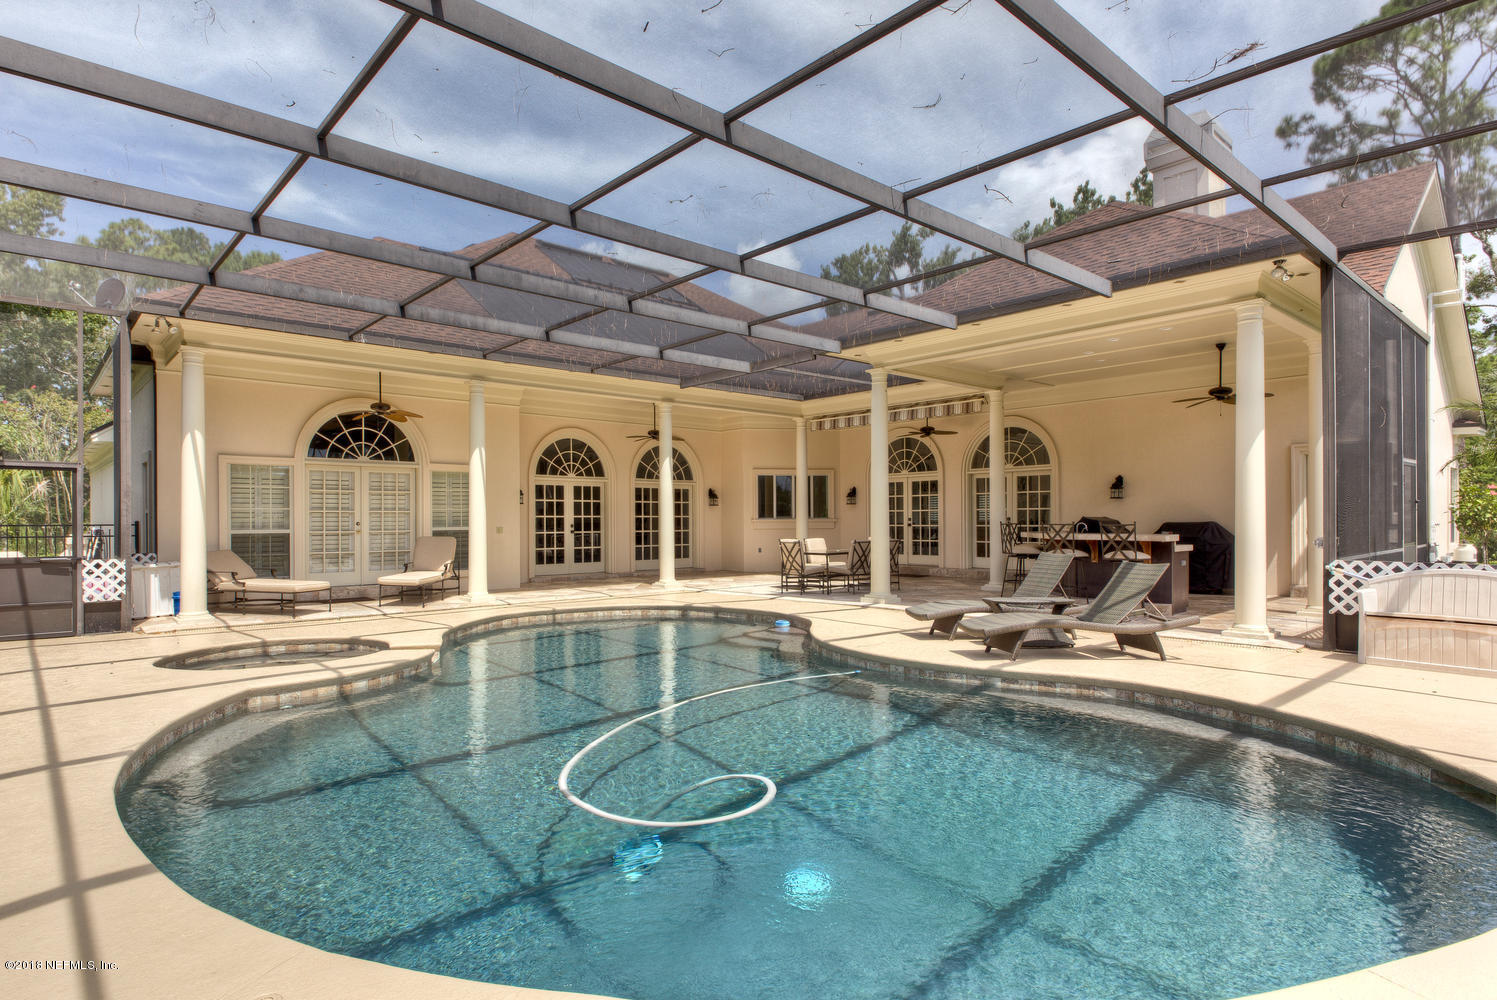 9060 MARSH VIEW, PONTE VEDRA BEACH, FLORIDA 32082, 4 Bedrooms Bedrooms, ,3 BathroomsBathrooms,Residential - single family,For sale,MARSH VIEW,947681